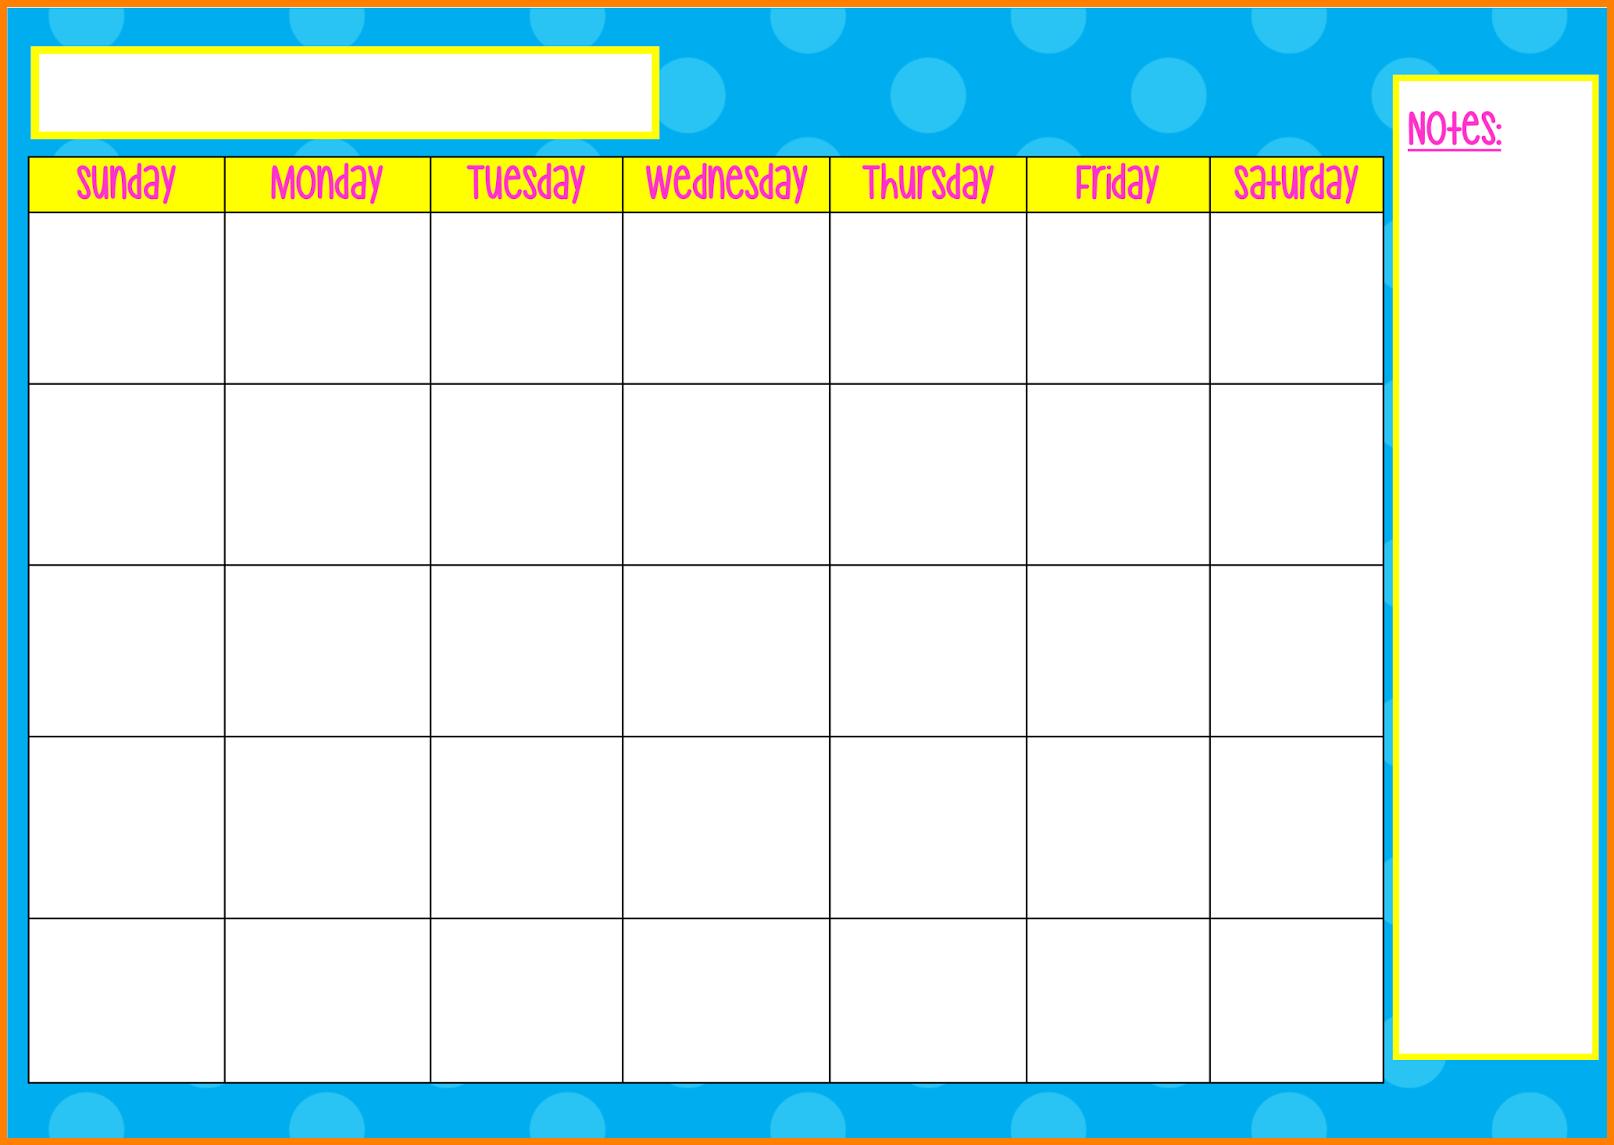 10+ Monday Thru Friday - Card Authorization 2017 Free Printable Monday Through Friday Calendar